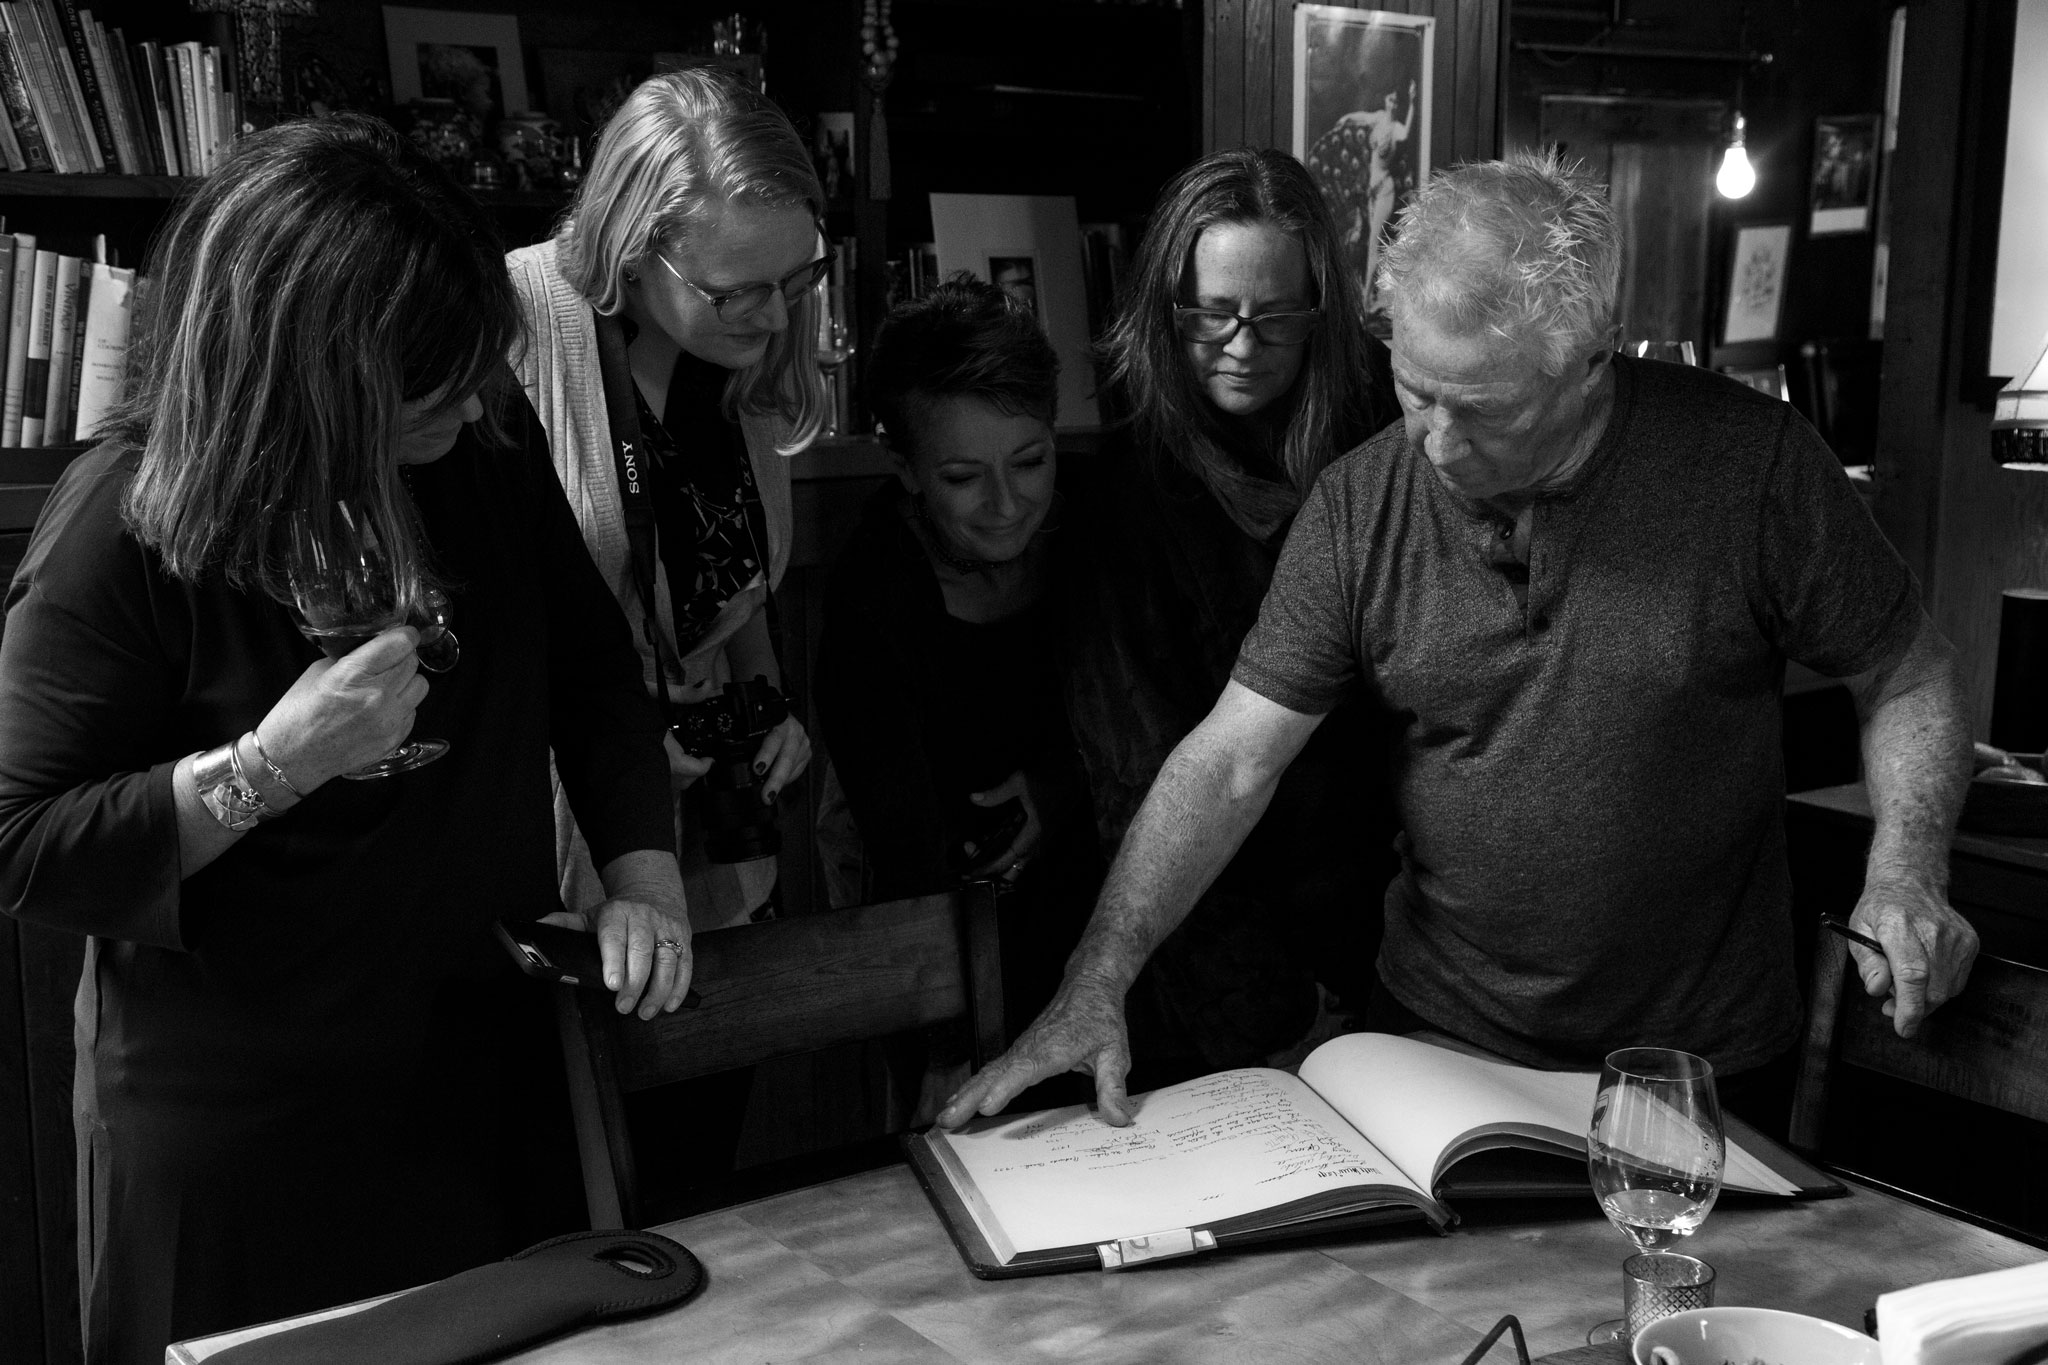 Anne Berry, Emma Powell, Lori Vrba (the exhibition's curator) and Heidi Kirkpatrick with Kim Weston